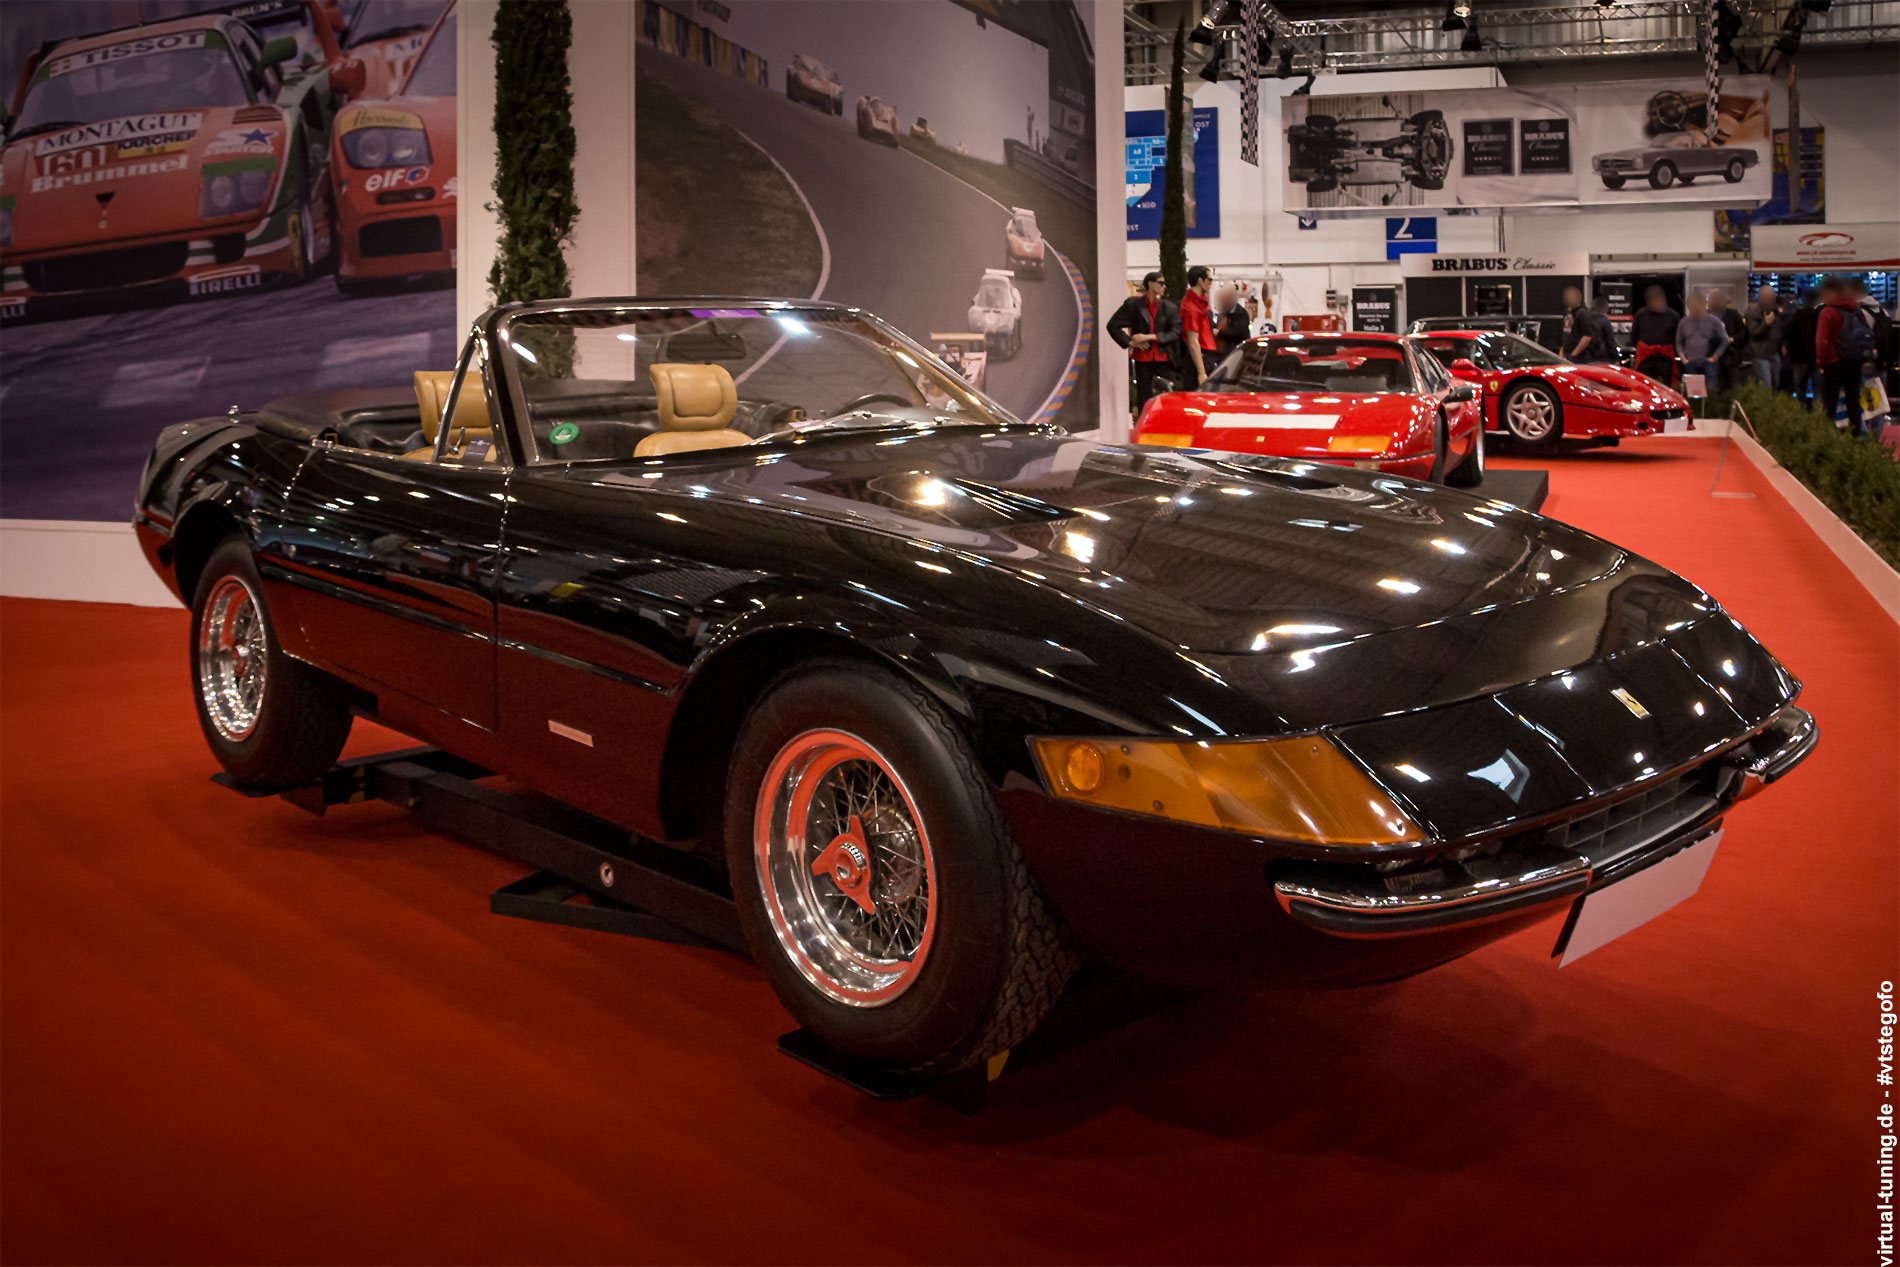 Ferrari 365 GTS/4 Daytona Spider - Essen Motor Show 2016